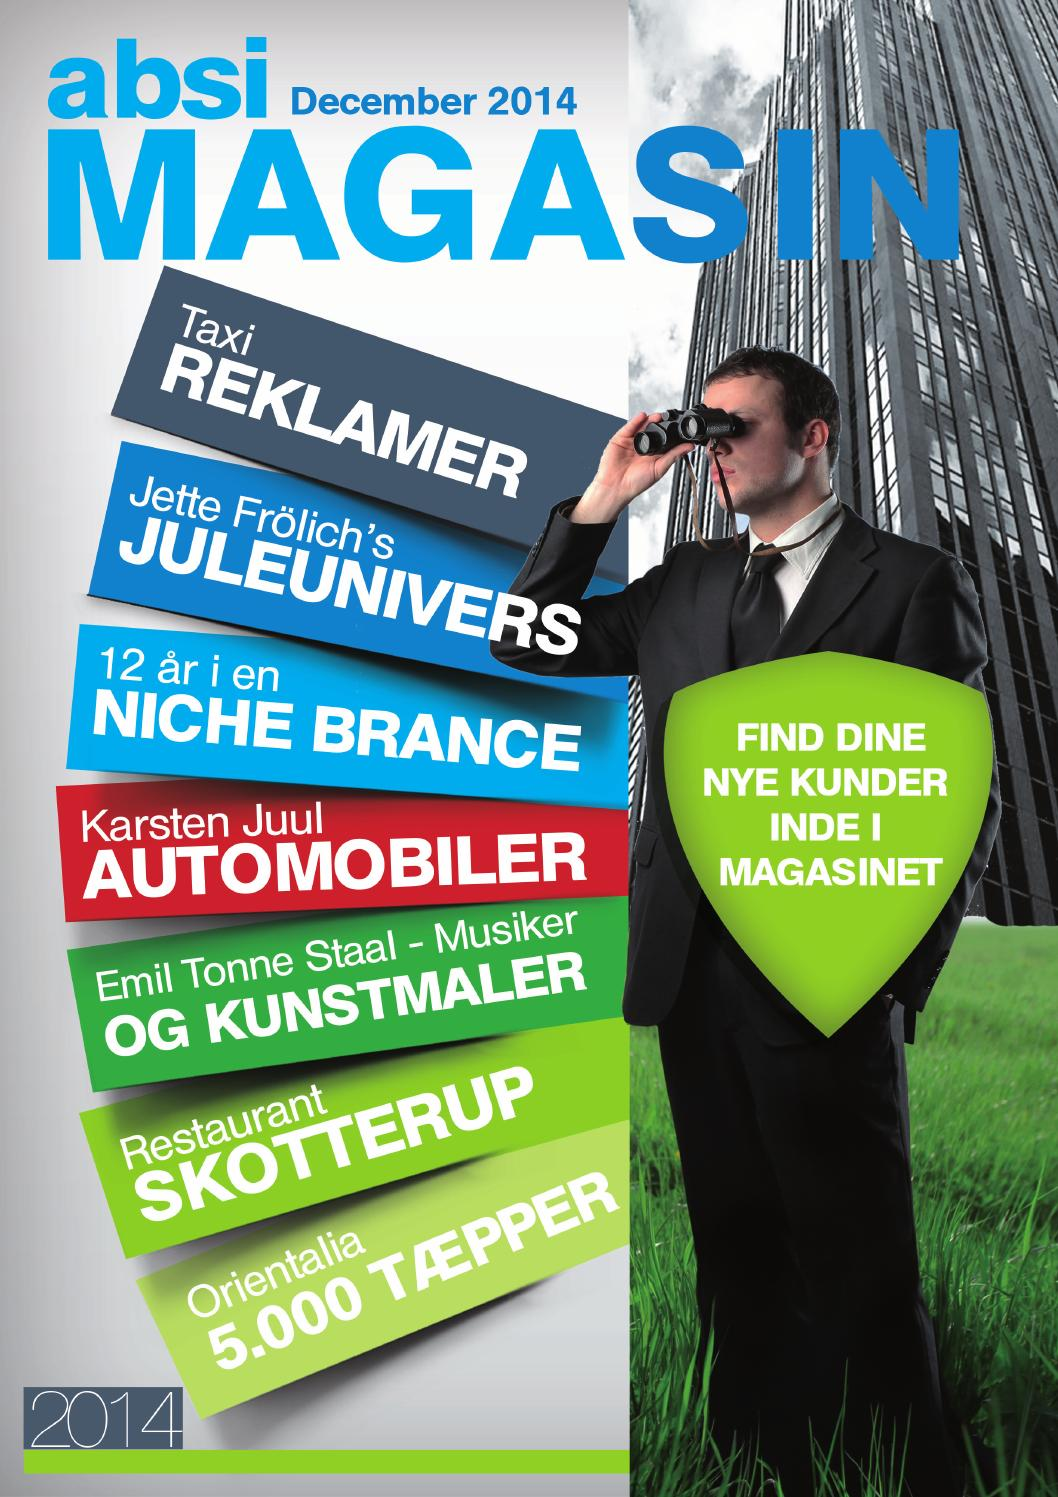 absi magasin december 2014 by Peter Fæster - issuu dd06fd50c7